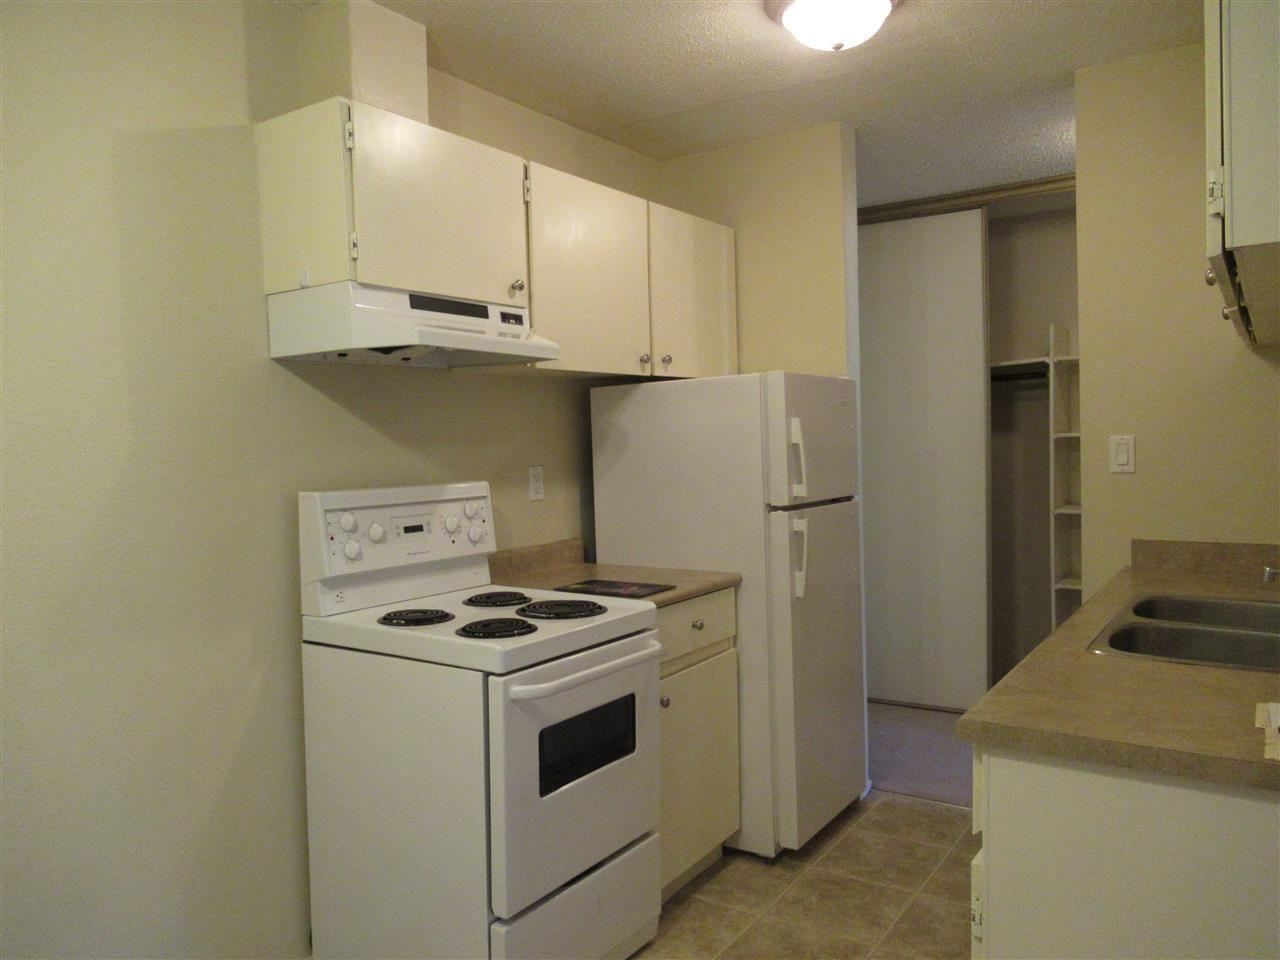 Photo 5: Photos: 103 280 N BROADWAY Avenue in Williams Lake: Williams Lake - City Condo for sale (Williams Lake (Zone 27))  : MLS®# R2455569